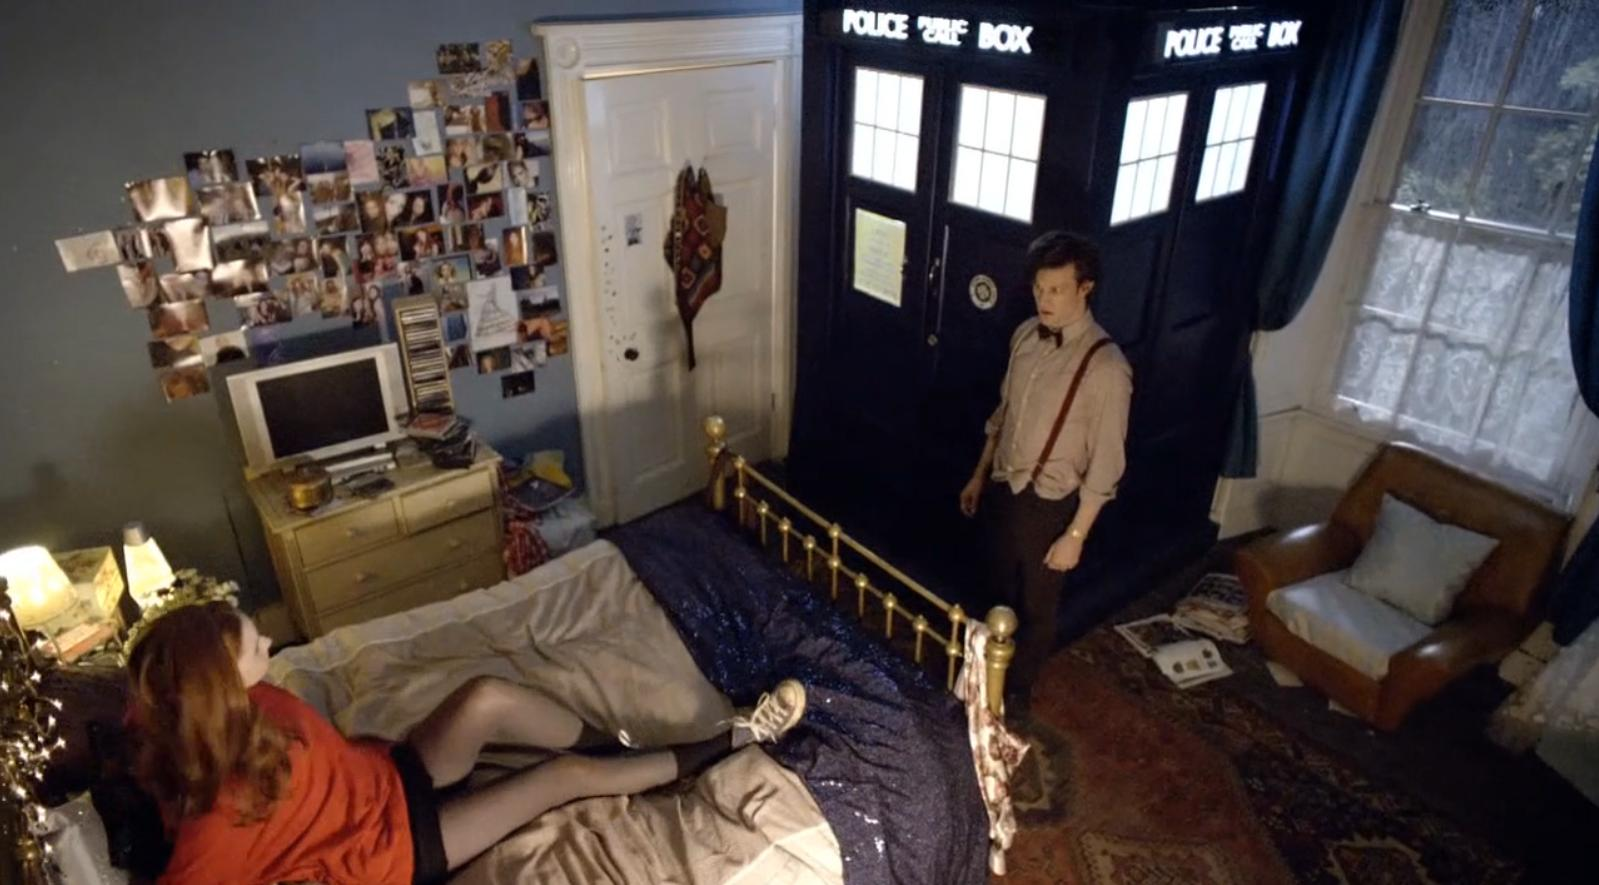 Comfy chairs doctor who - Comfy Chairs Doctor Who 30